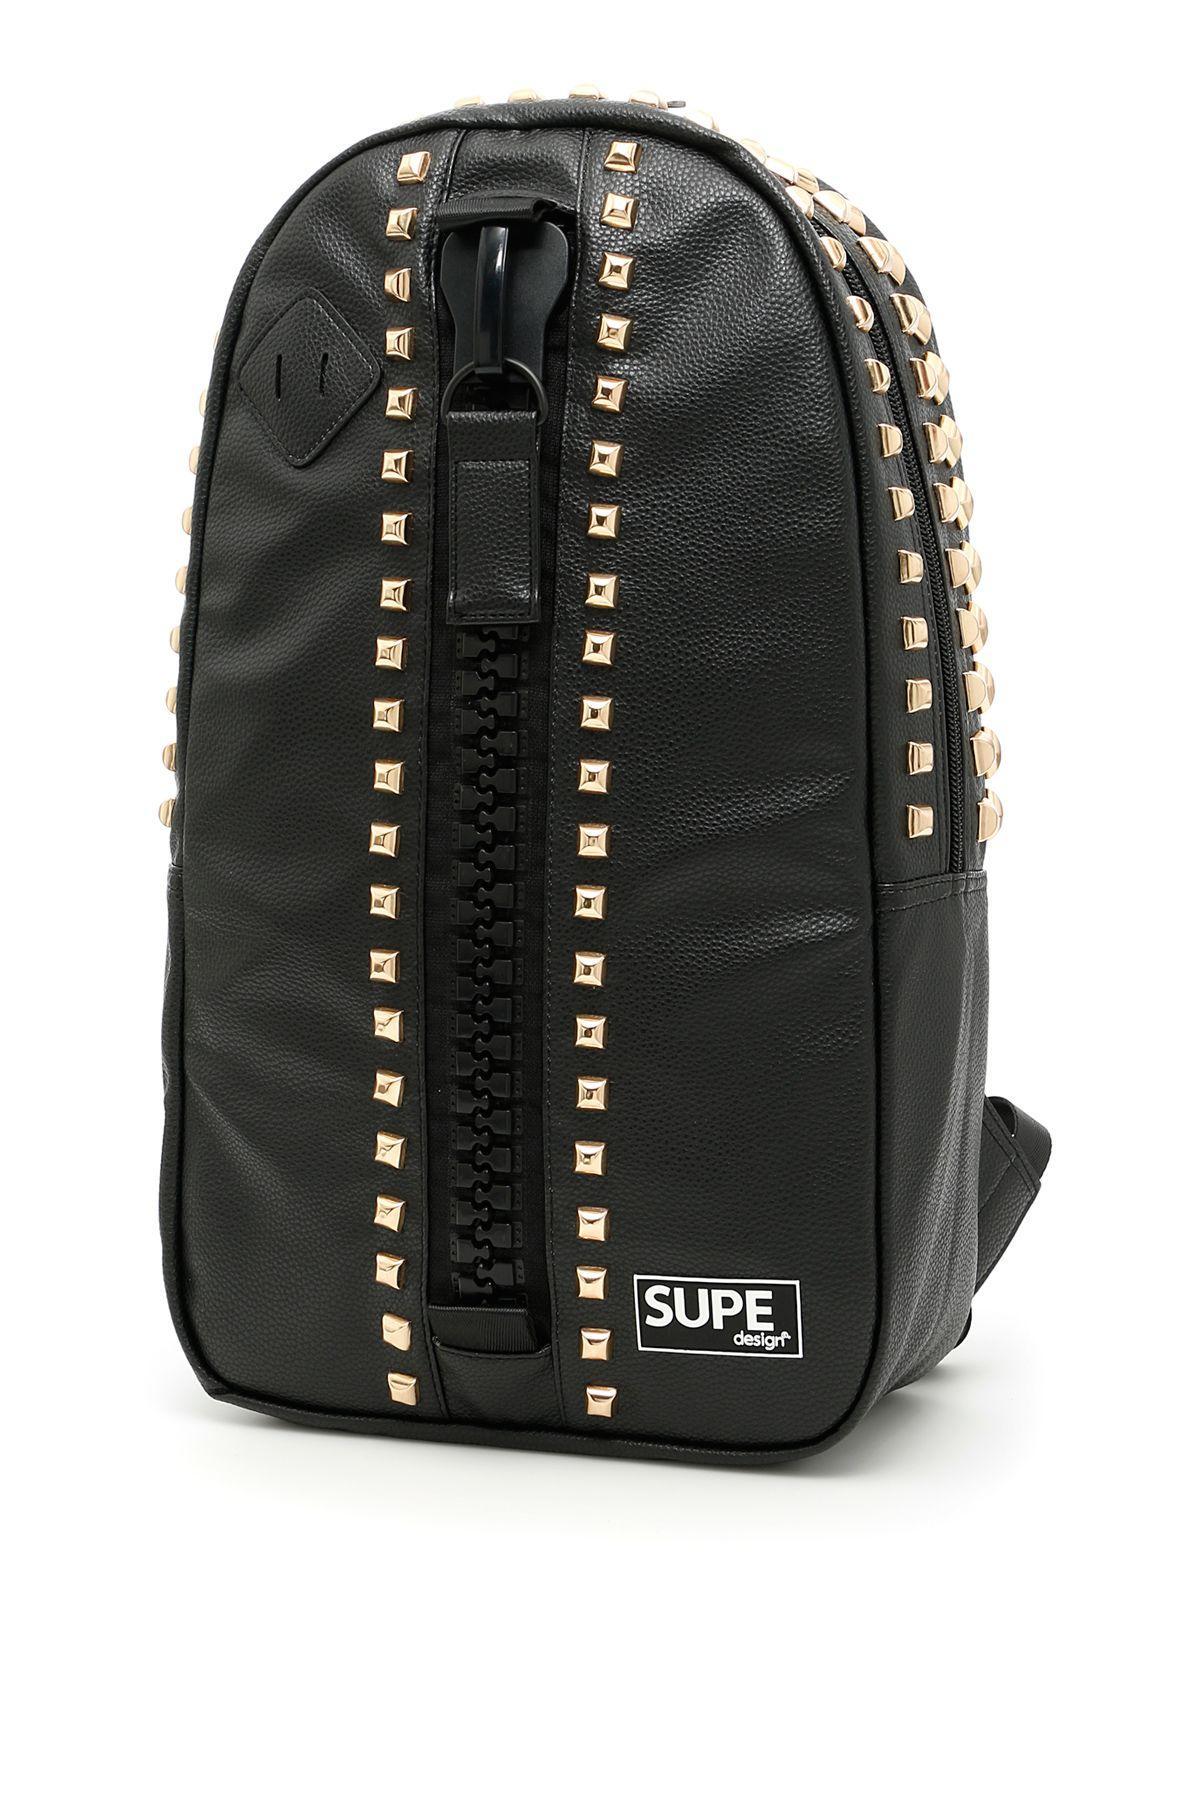 Supe Design Day Bag Rock Backpack In Blacknero